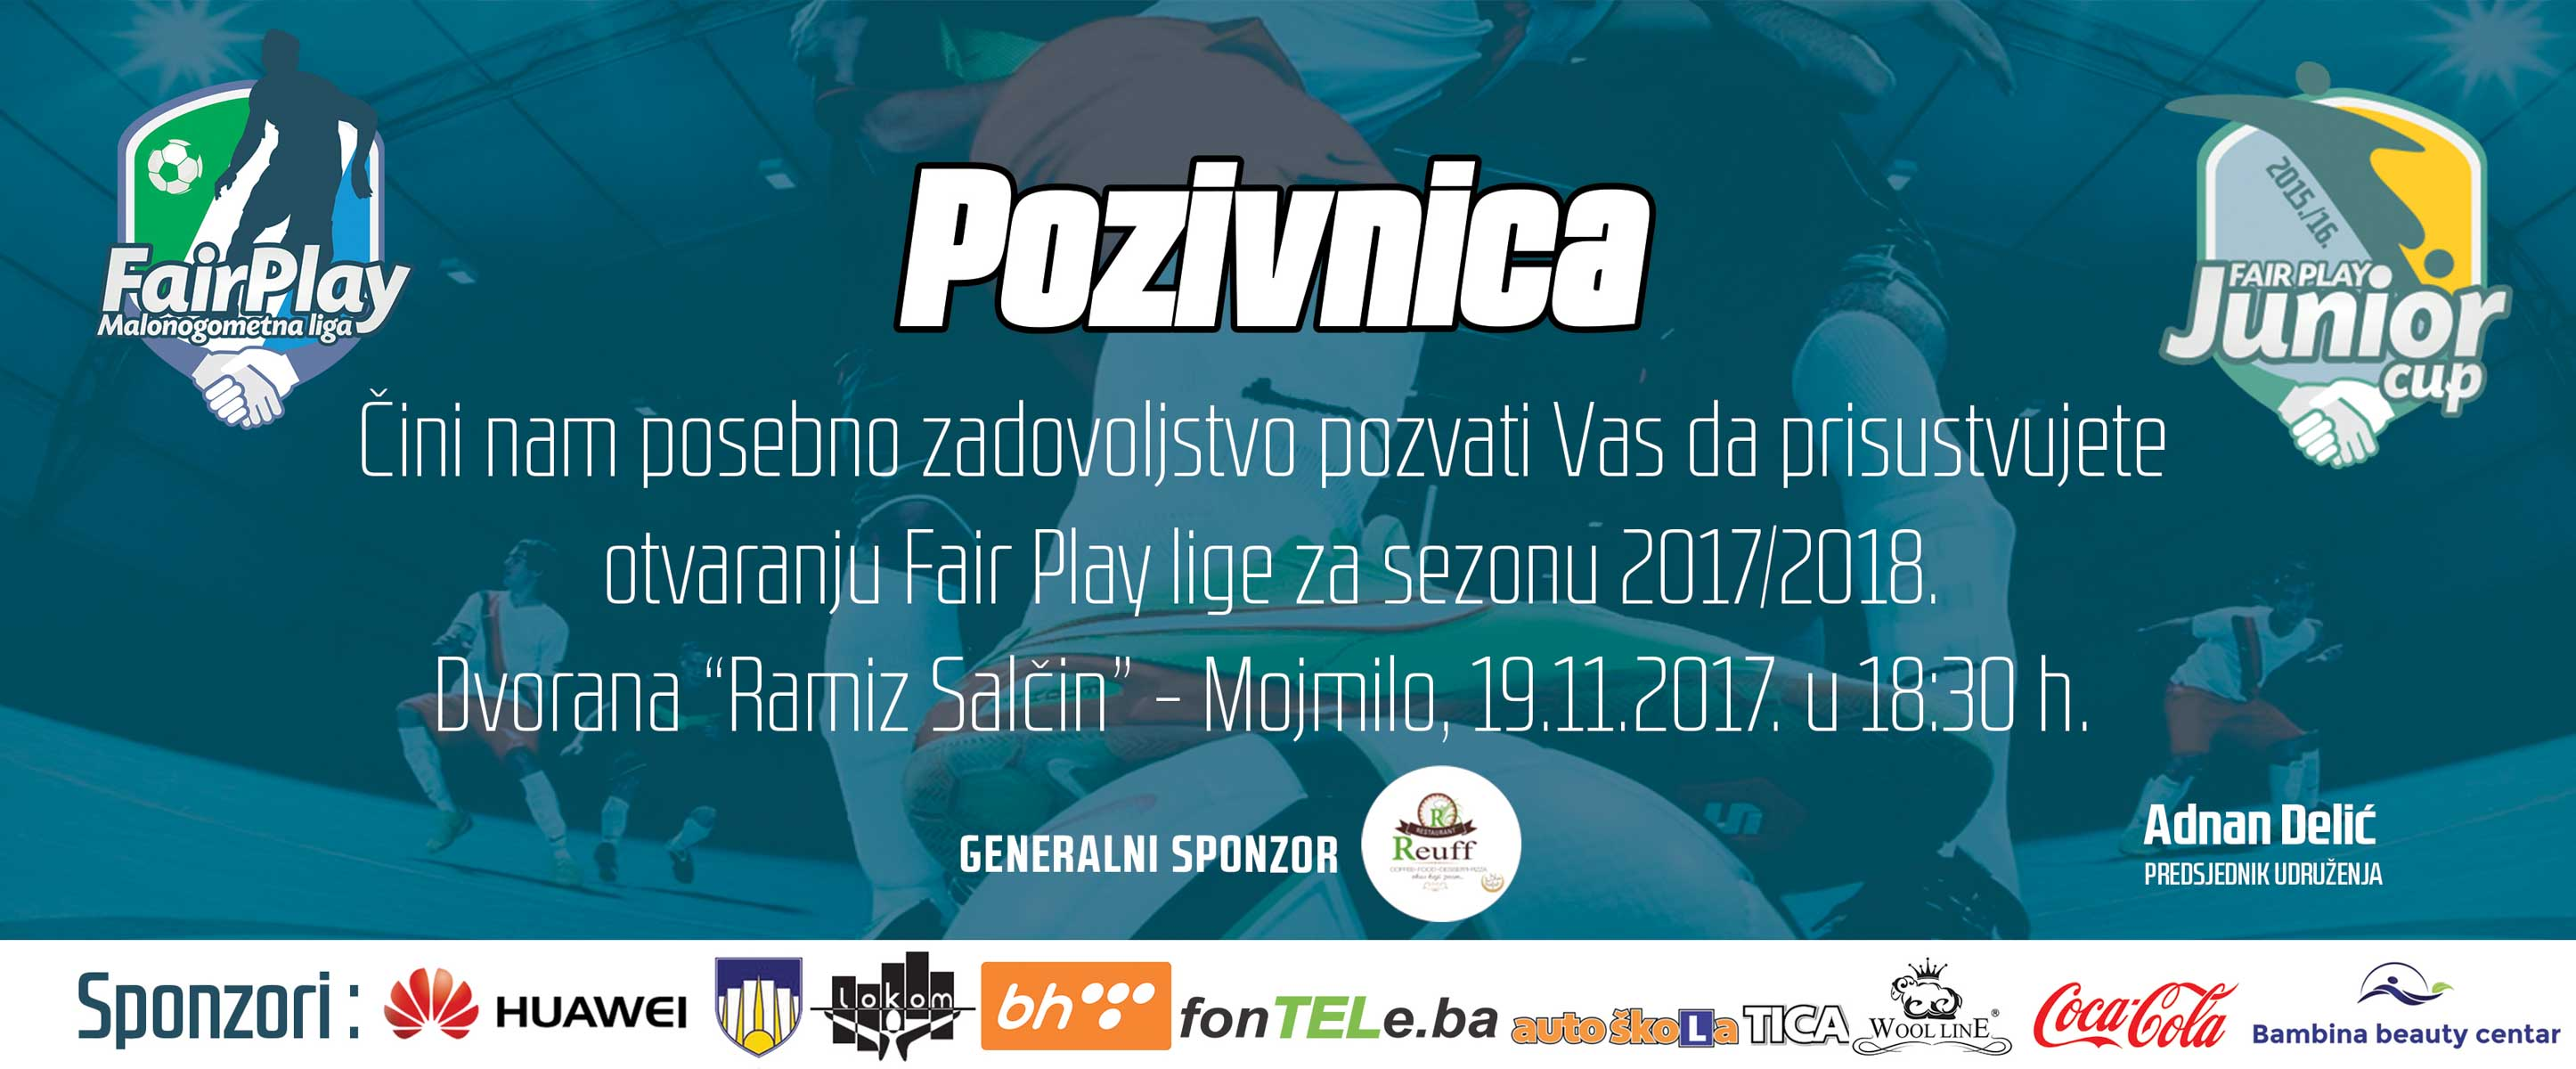 Fairplay pozivnica_2017